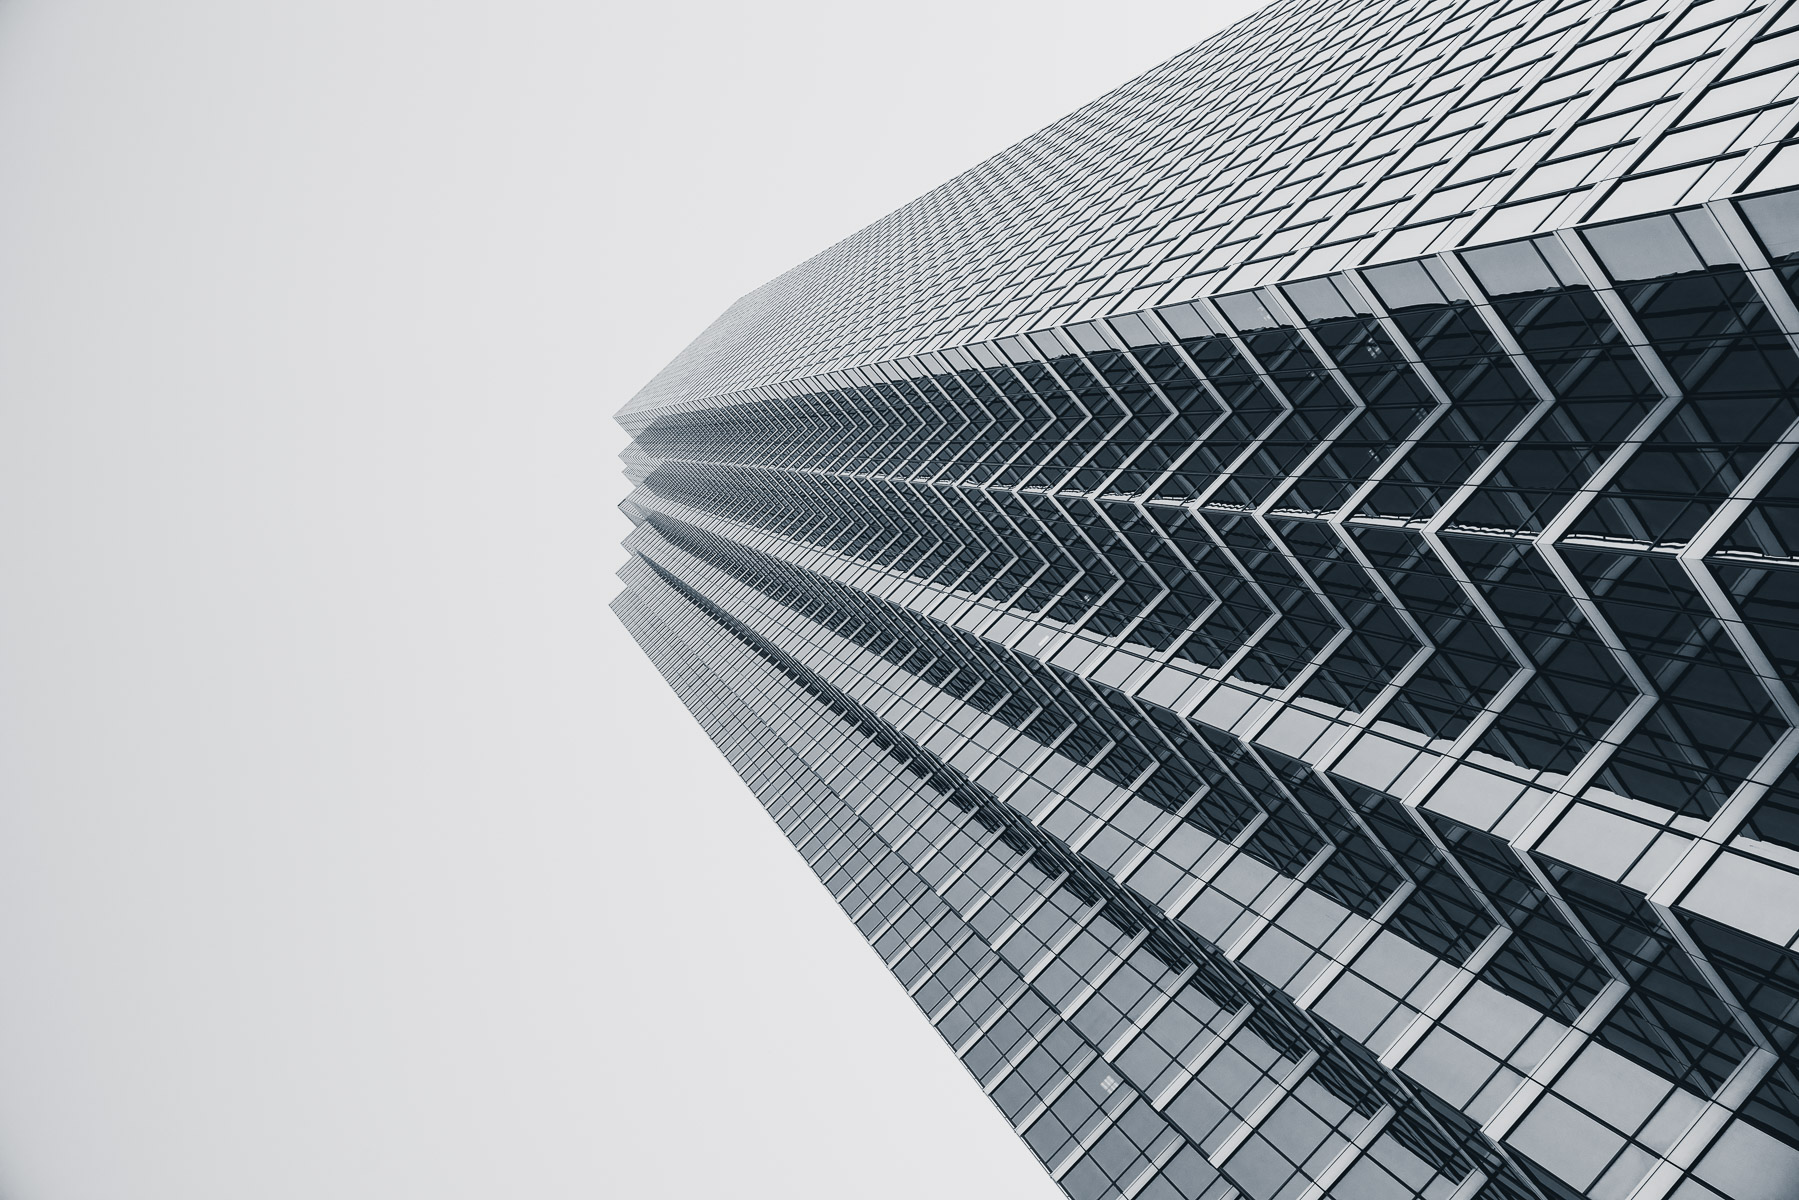 Dallas' Bank of America Plaza stretches into the North Texas sky.